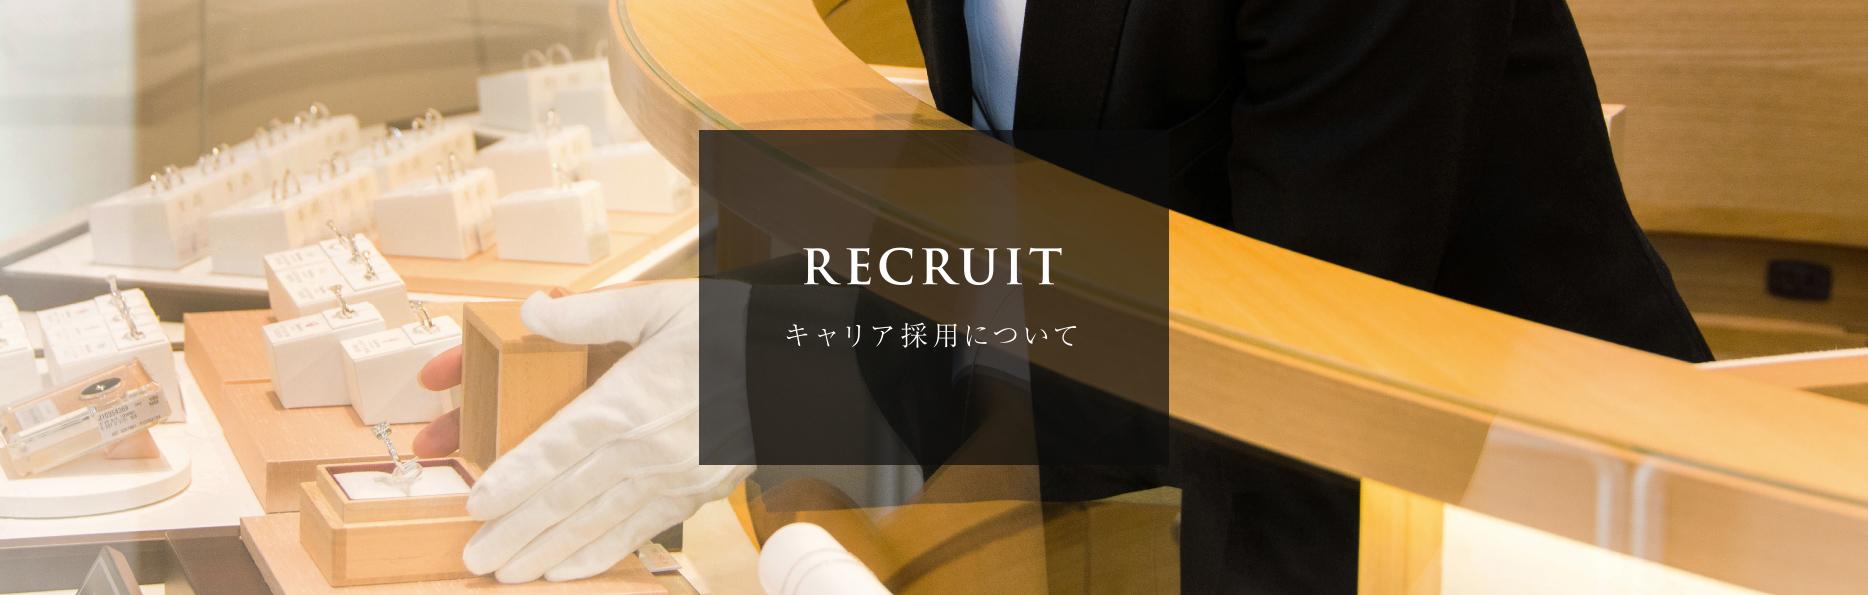 RECRUIT キャリア採用について